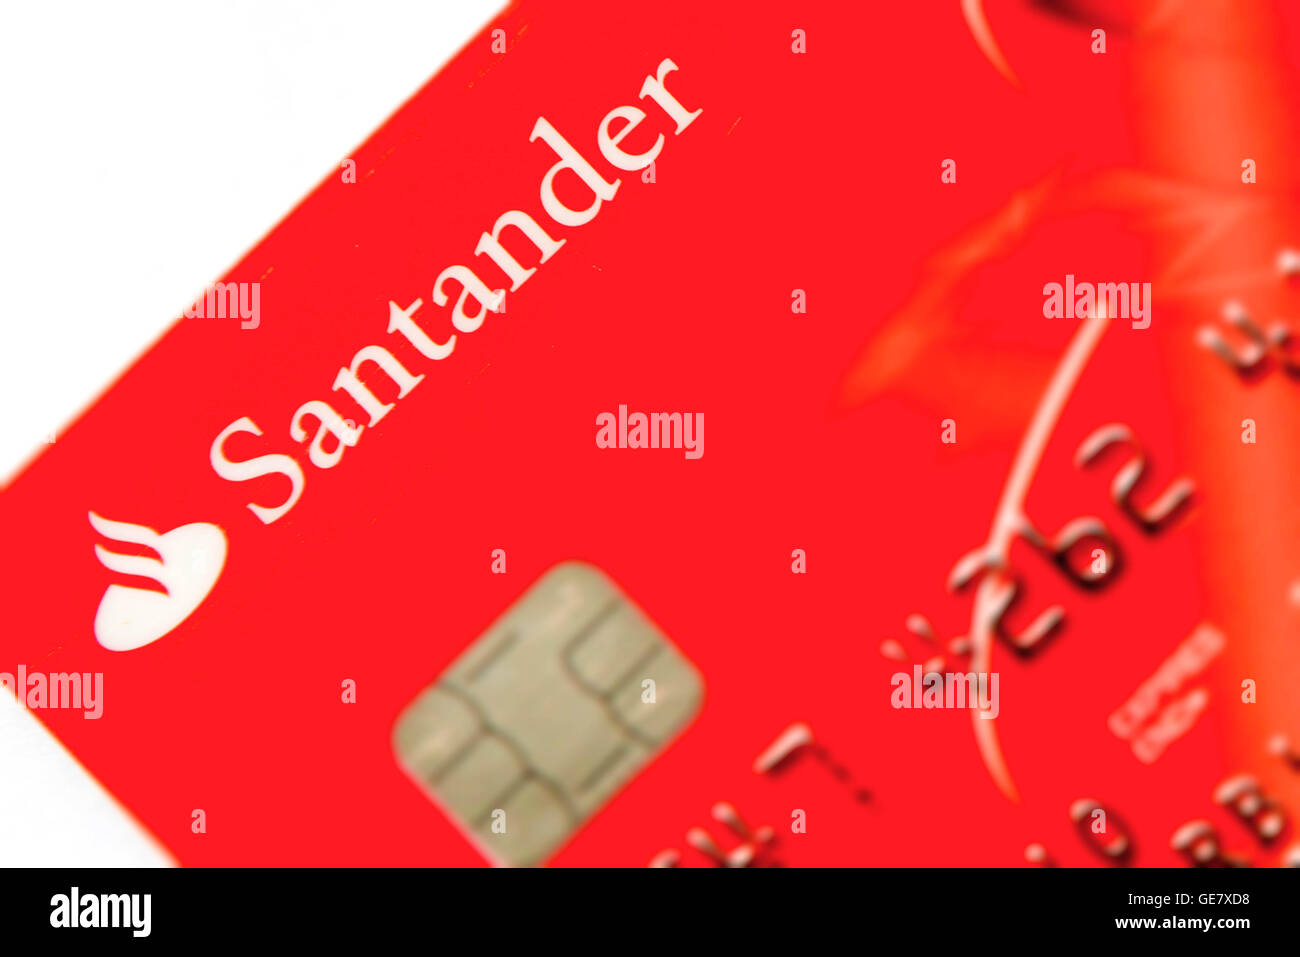 Santander Bank Karte Detail Stockfoto Bild 112041812 Alamy